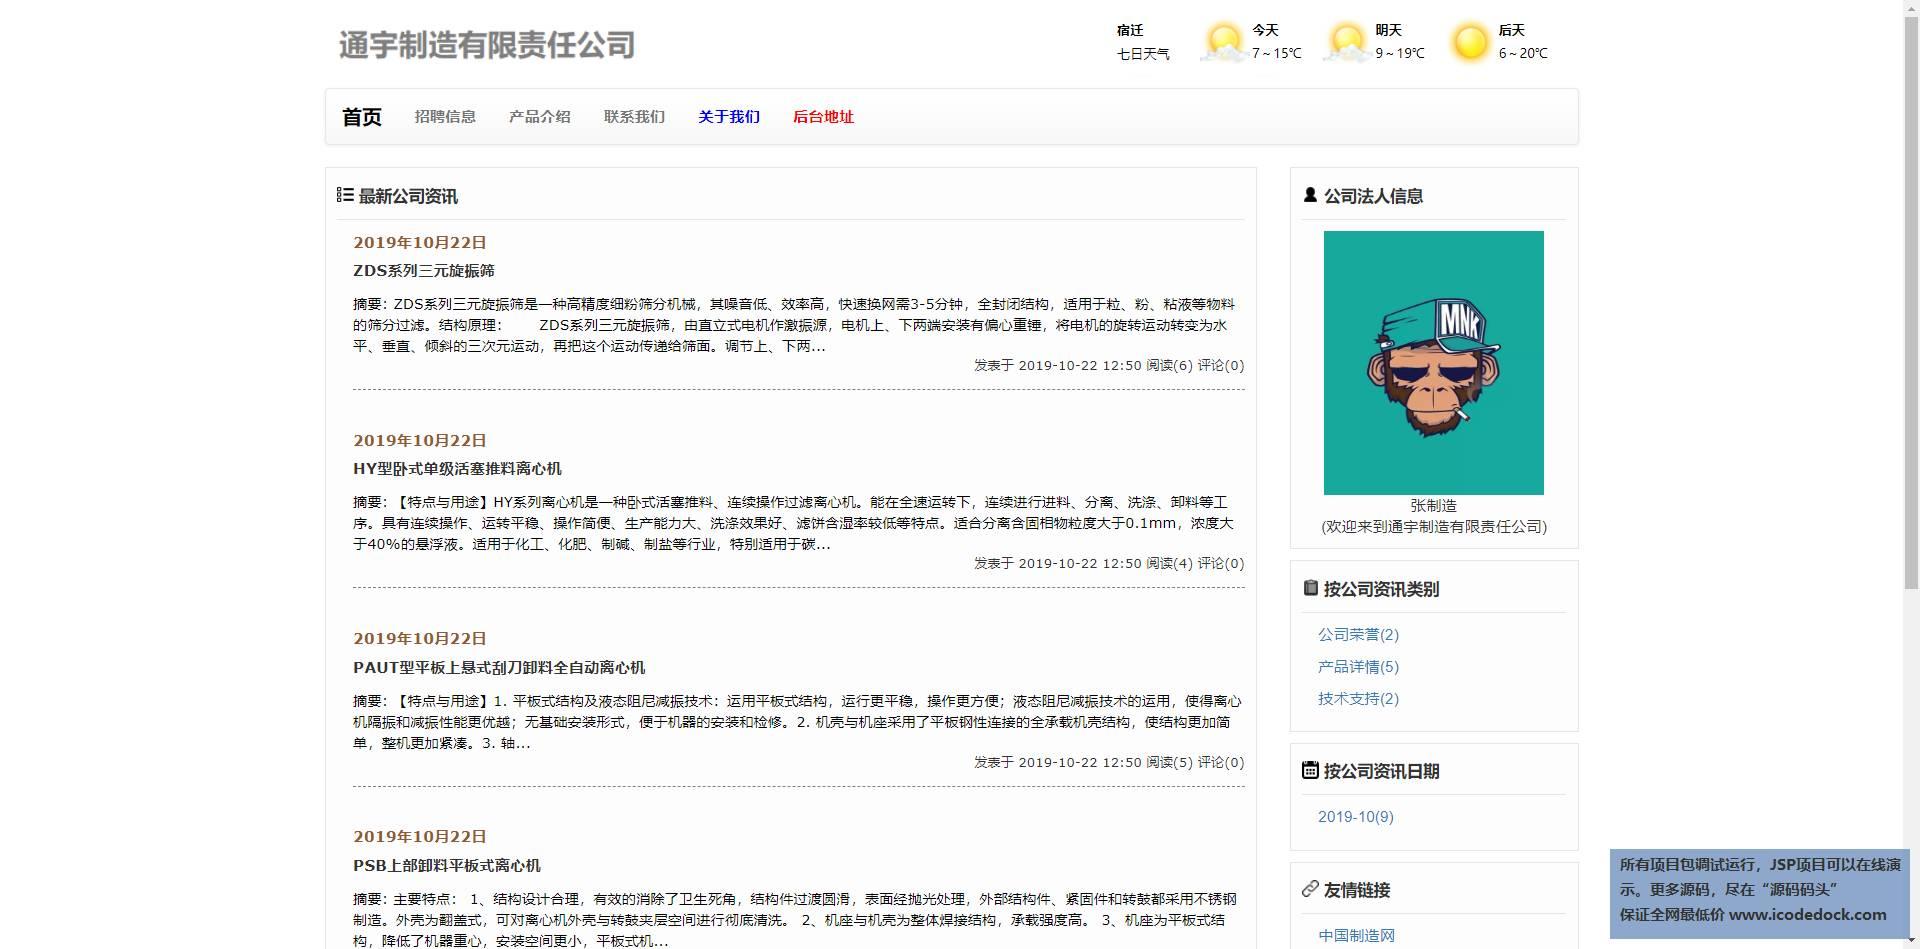 ssm企业网站源码下载(php网站源码 下载) (https://www.oilcn.net.cn/) 网站运营 第25张